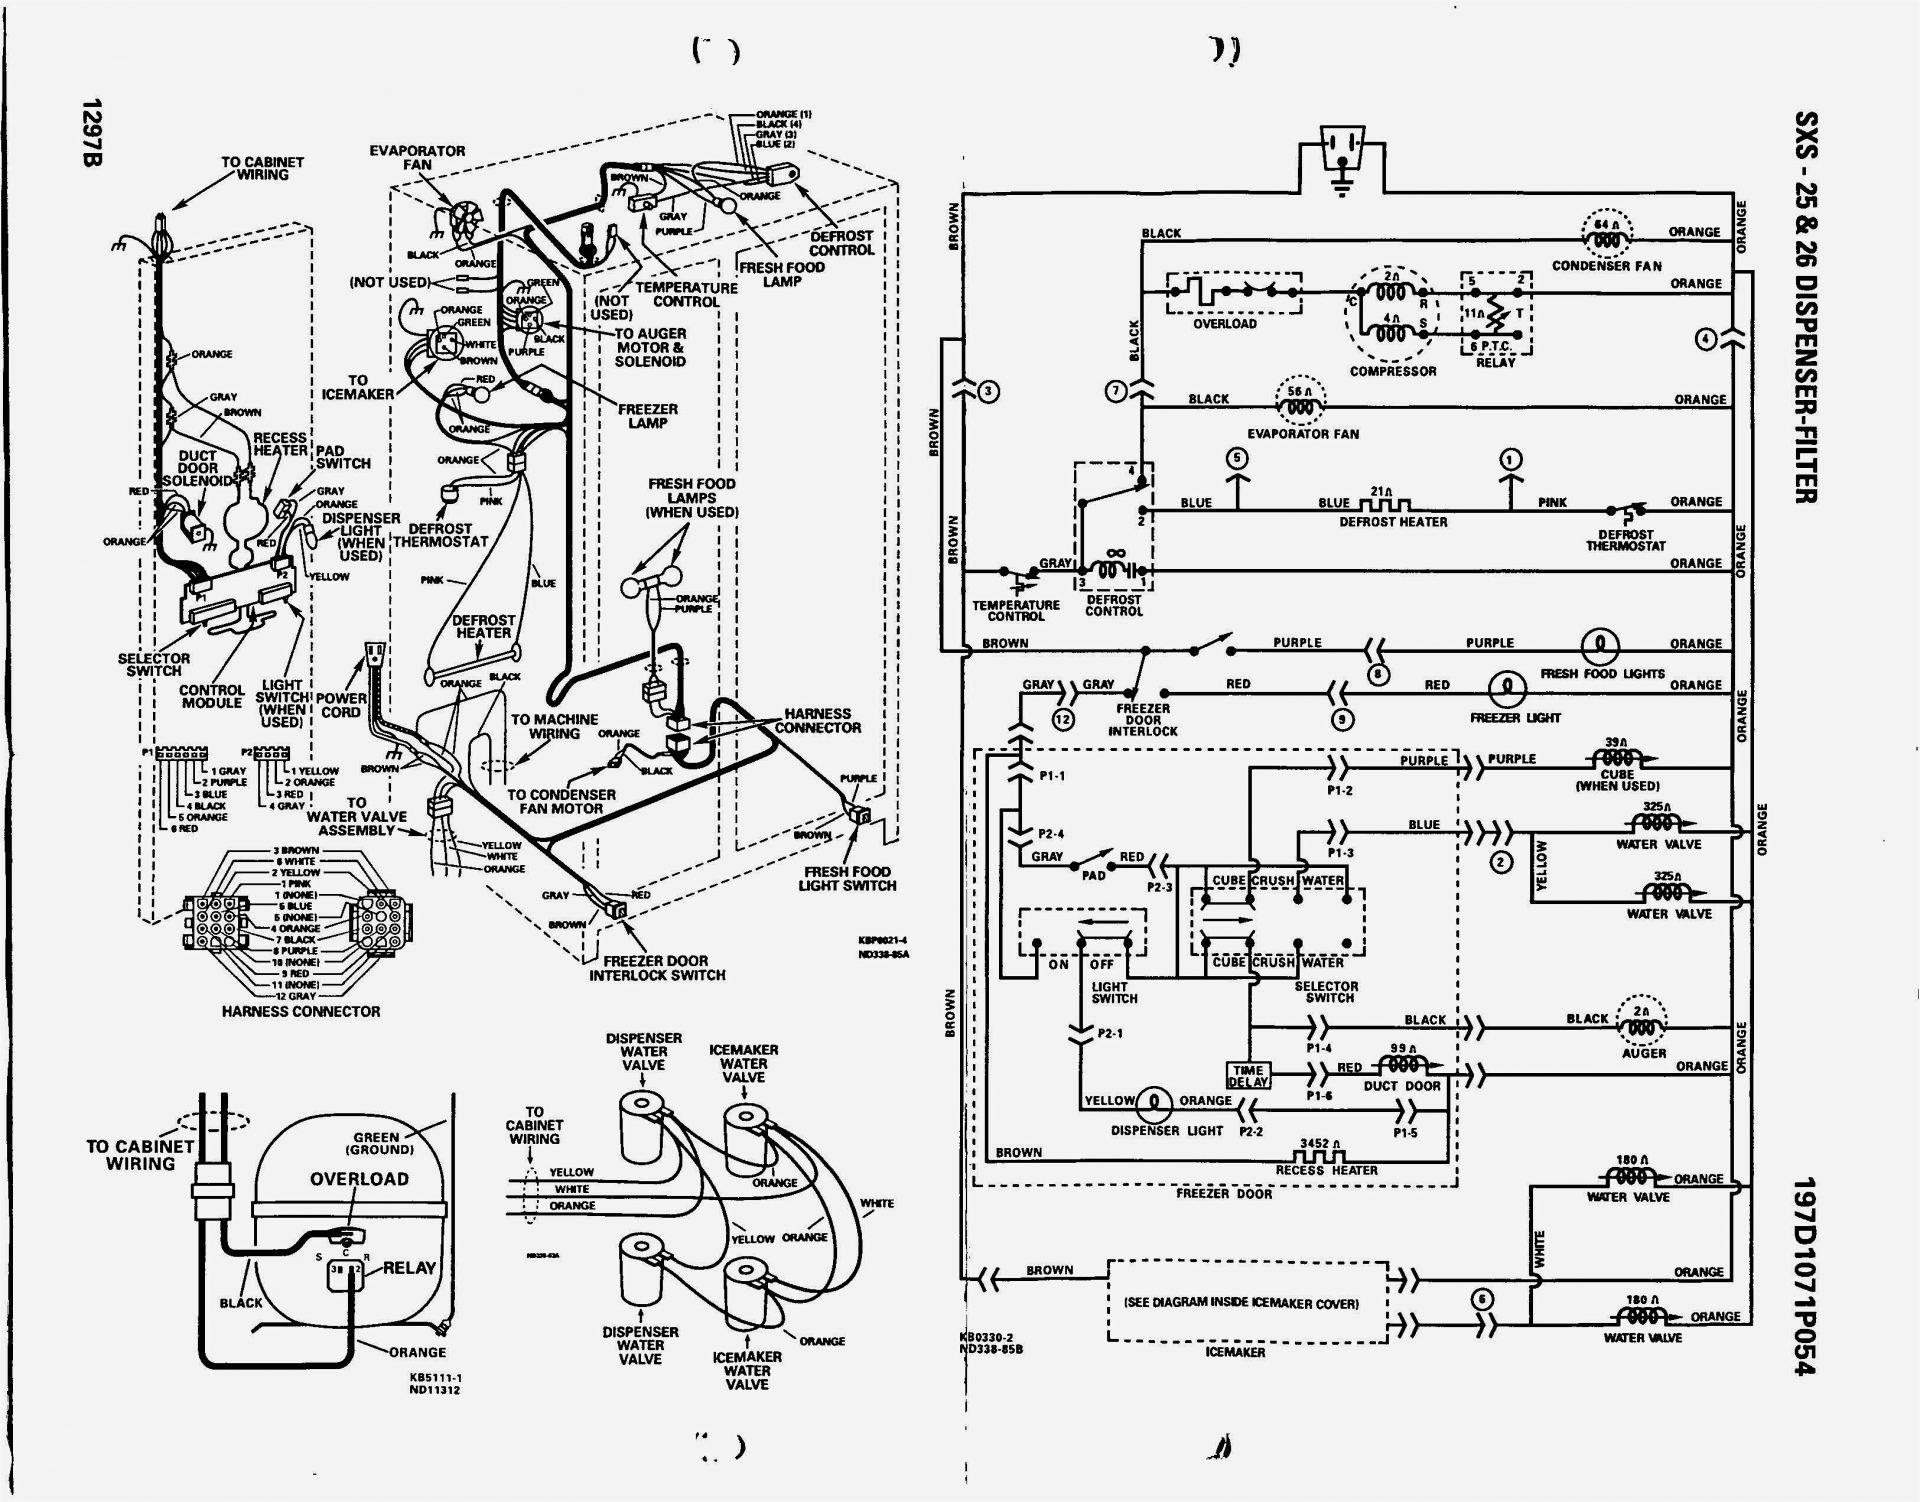 230 Volt Motor Wiring Diagram from i0.wp.com